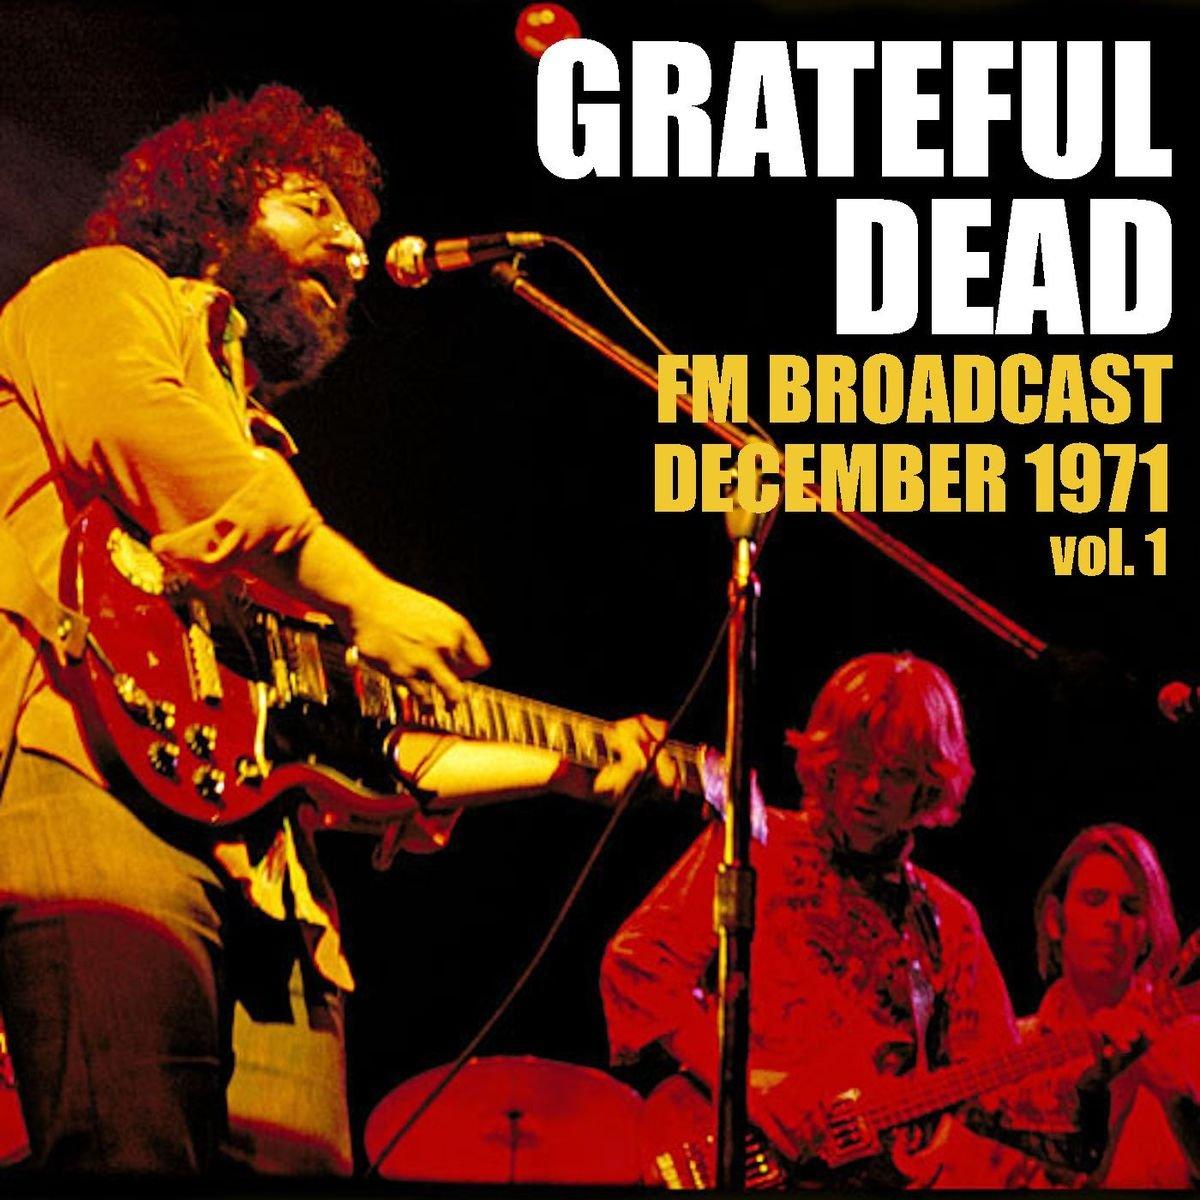 Grateful Dead - FM Broadcast December 1971 Vol. 1 (2020) CD